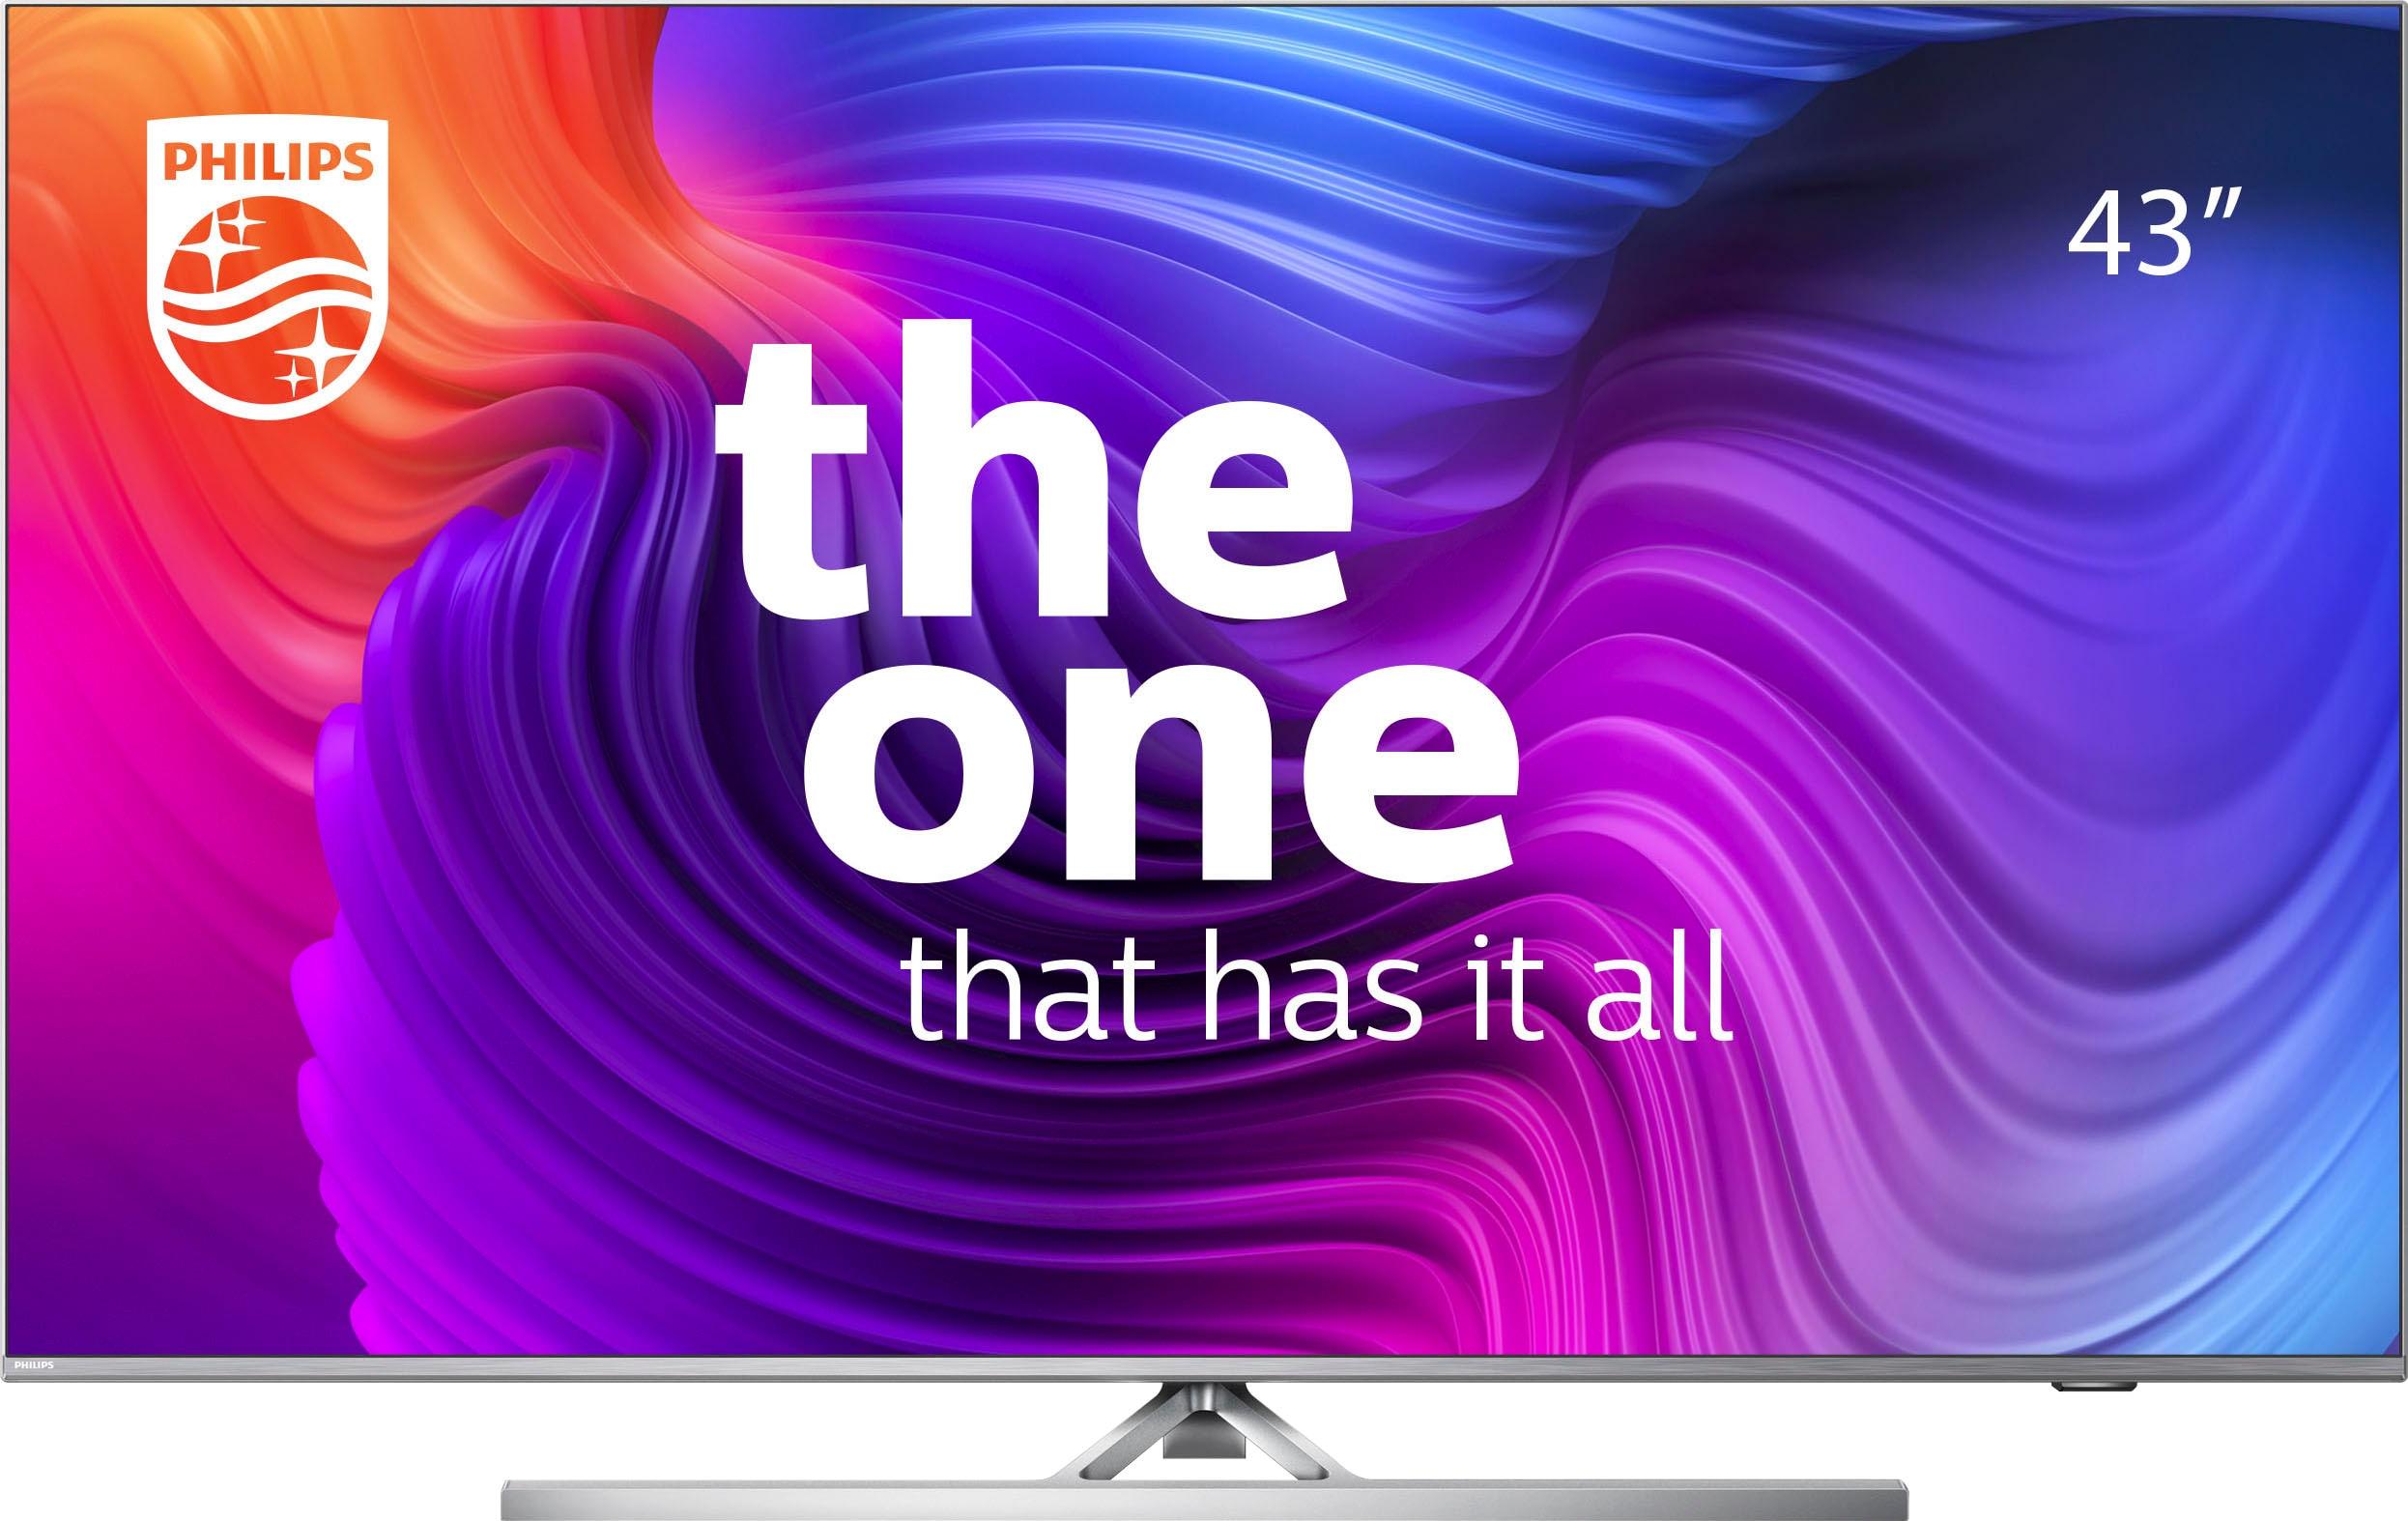 Philips LED-Fernseher 43PUS8506 12 , 108 cm 43 , 4K Ultra HD, Smart-TV